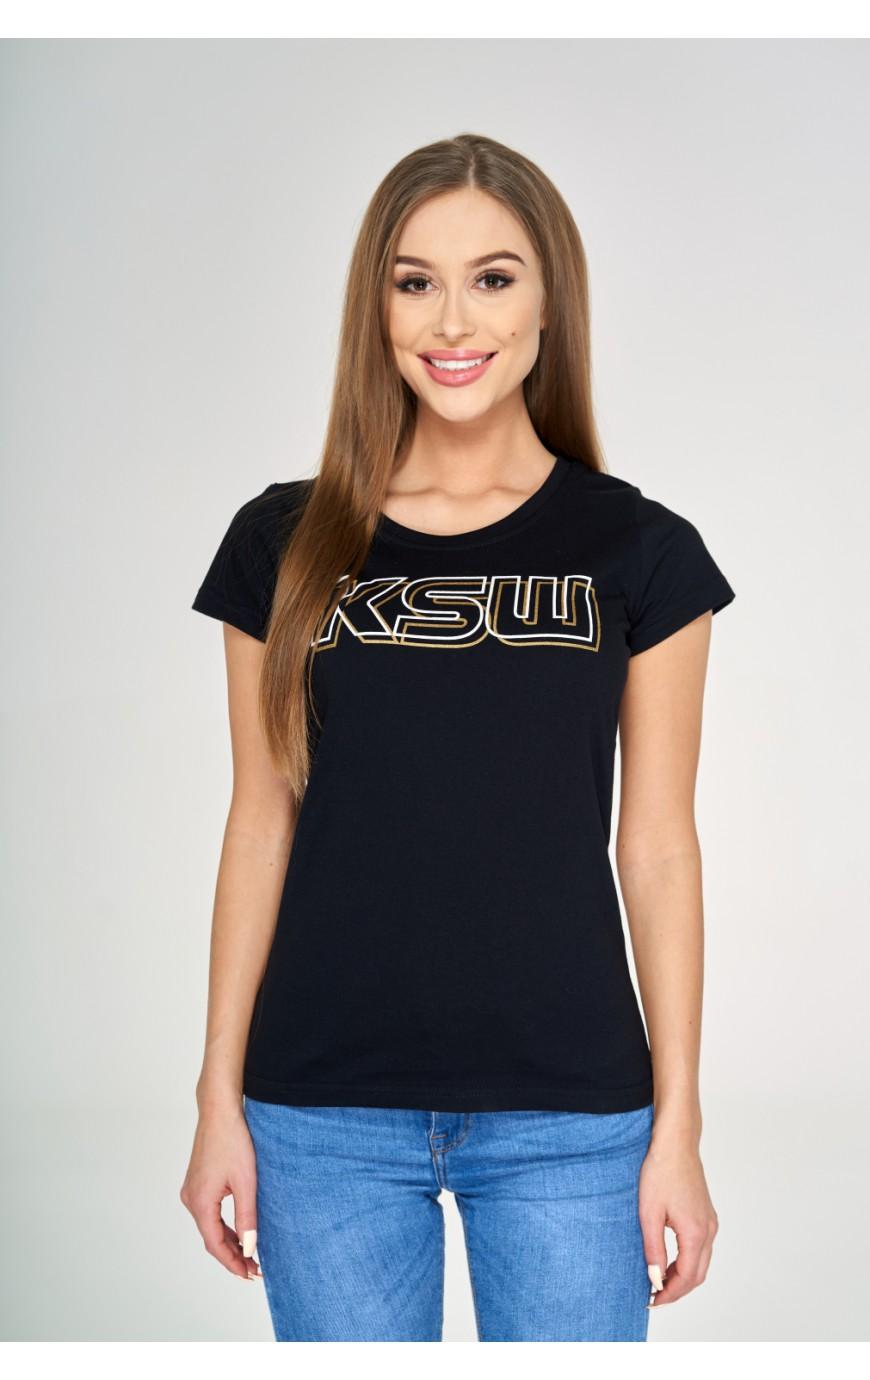 T-shirt czarny KSW Basic